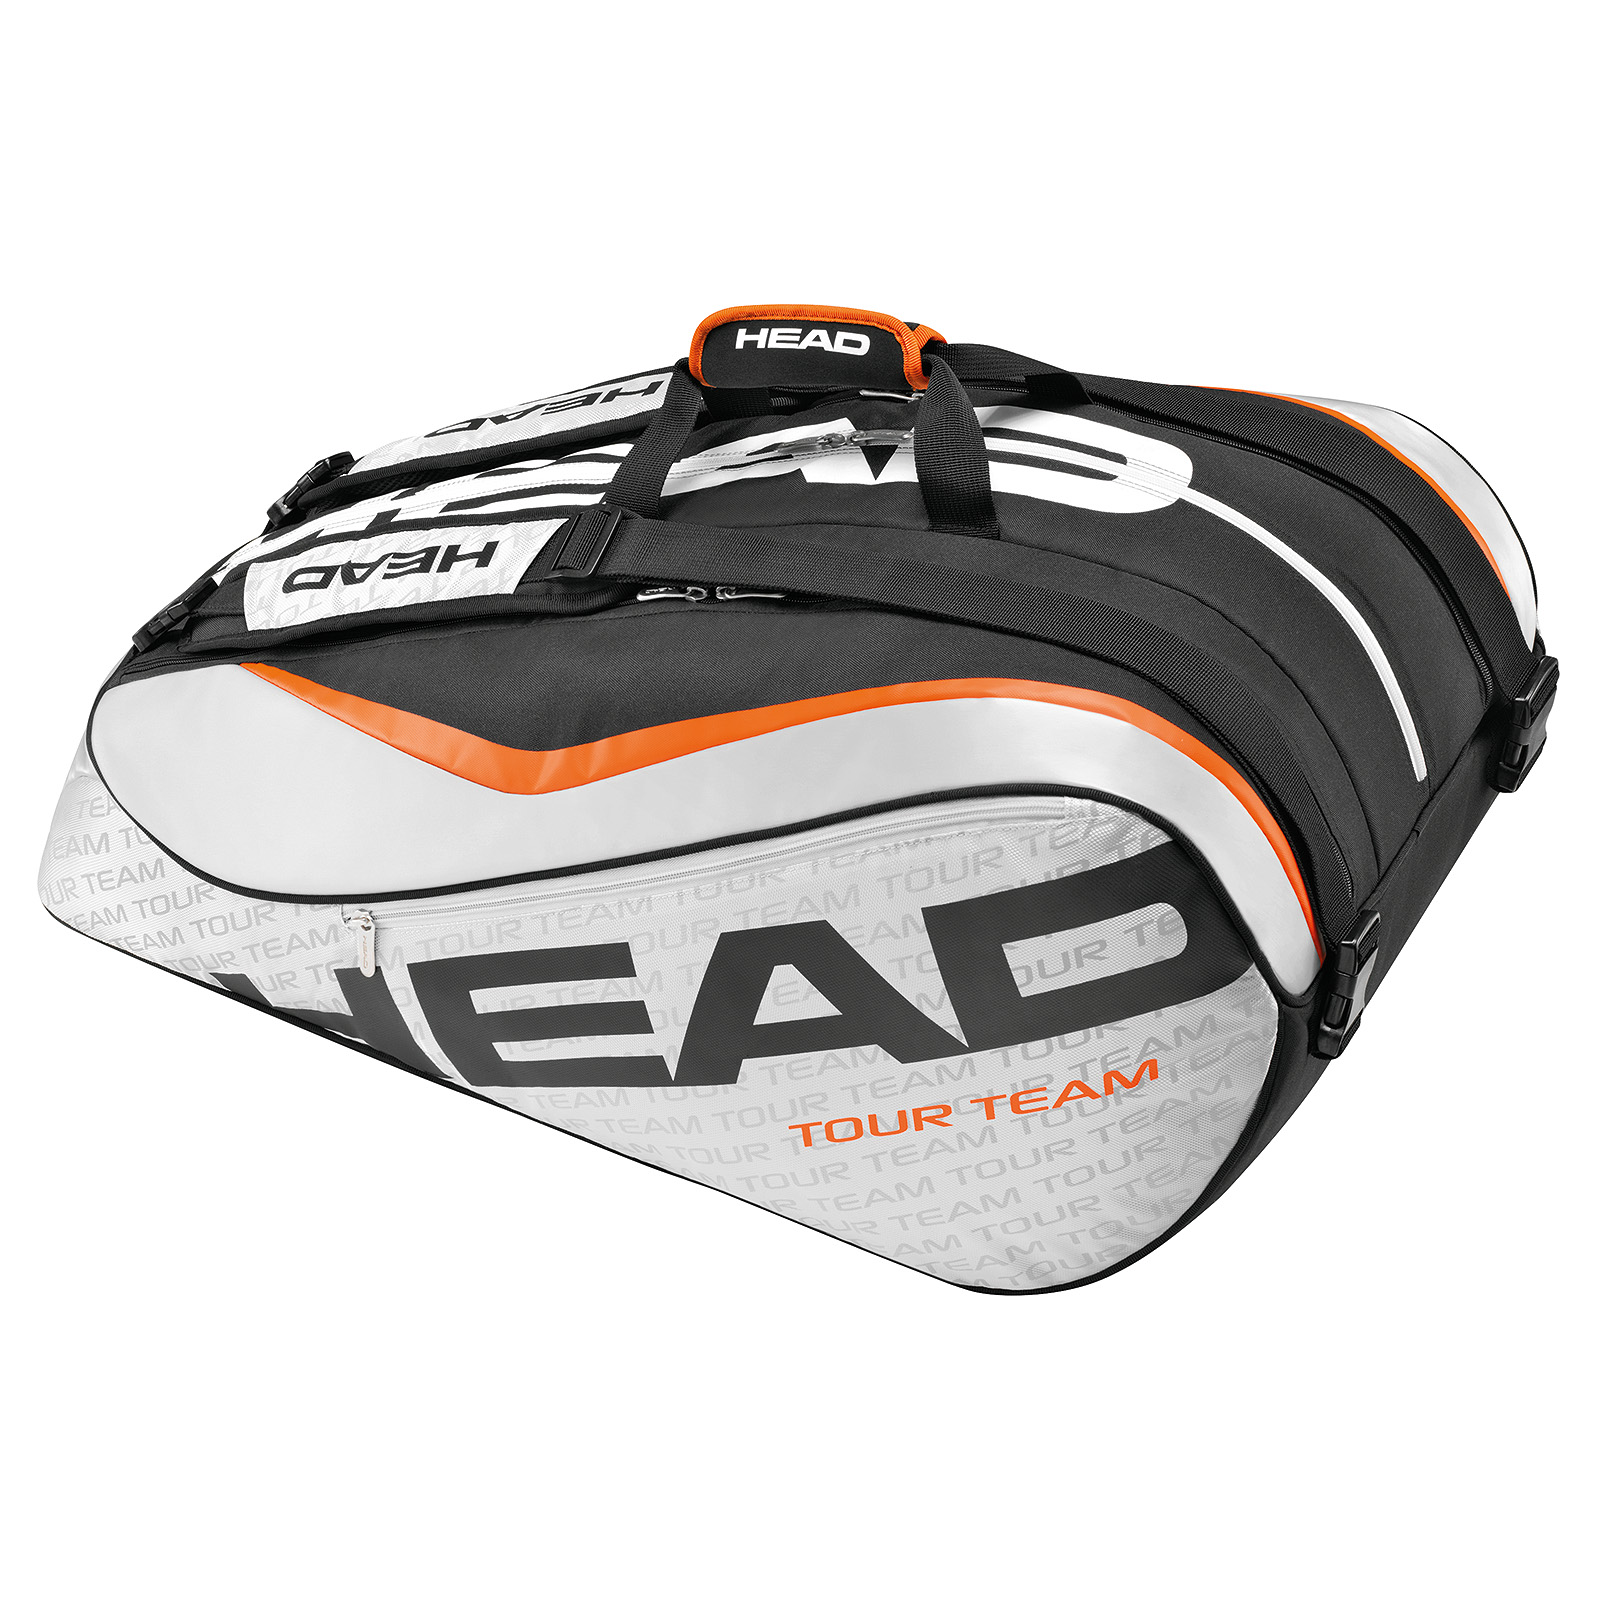 HEAD Tour Team 12R Monstercombi Black/Silver